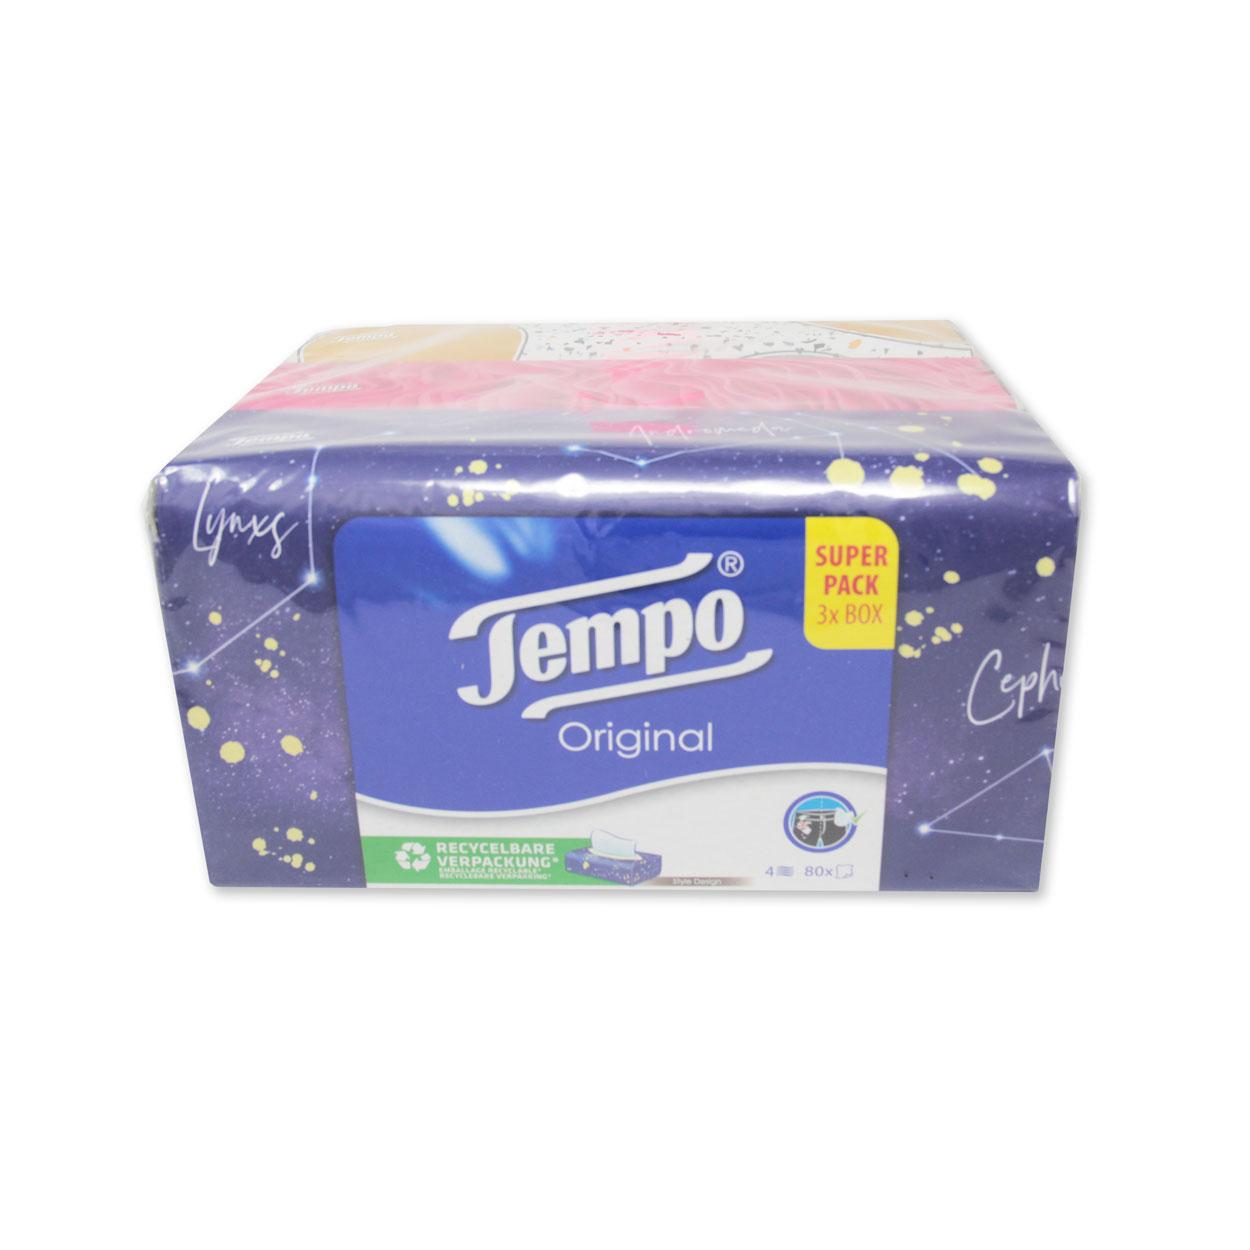 Tempo Design Edition Taschentücher Box, 4-lagig - 1 Trio-Box = 3 x 80 Tücher